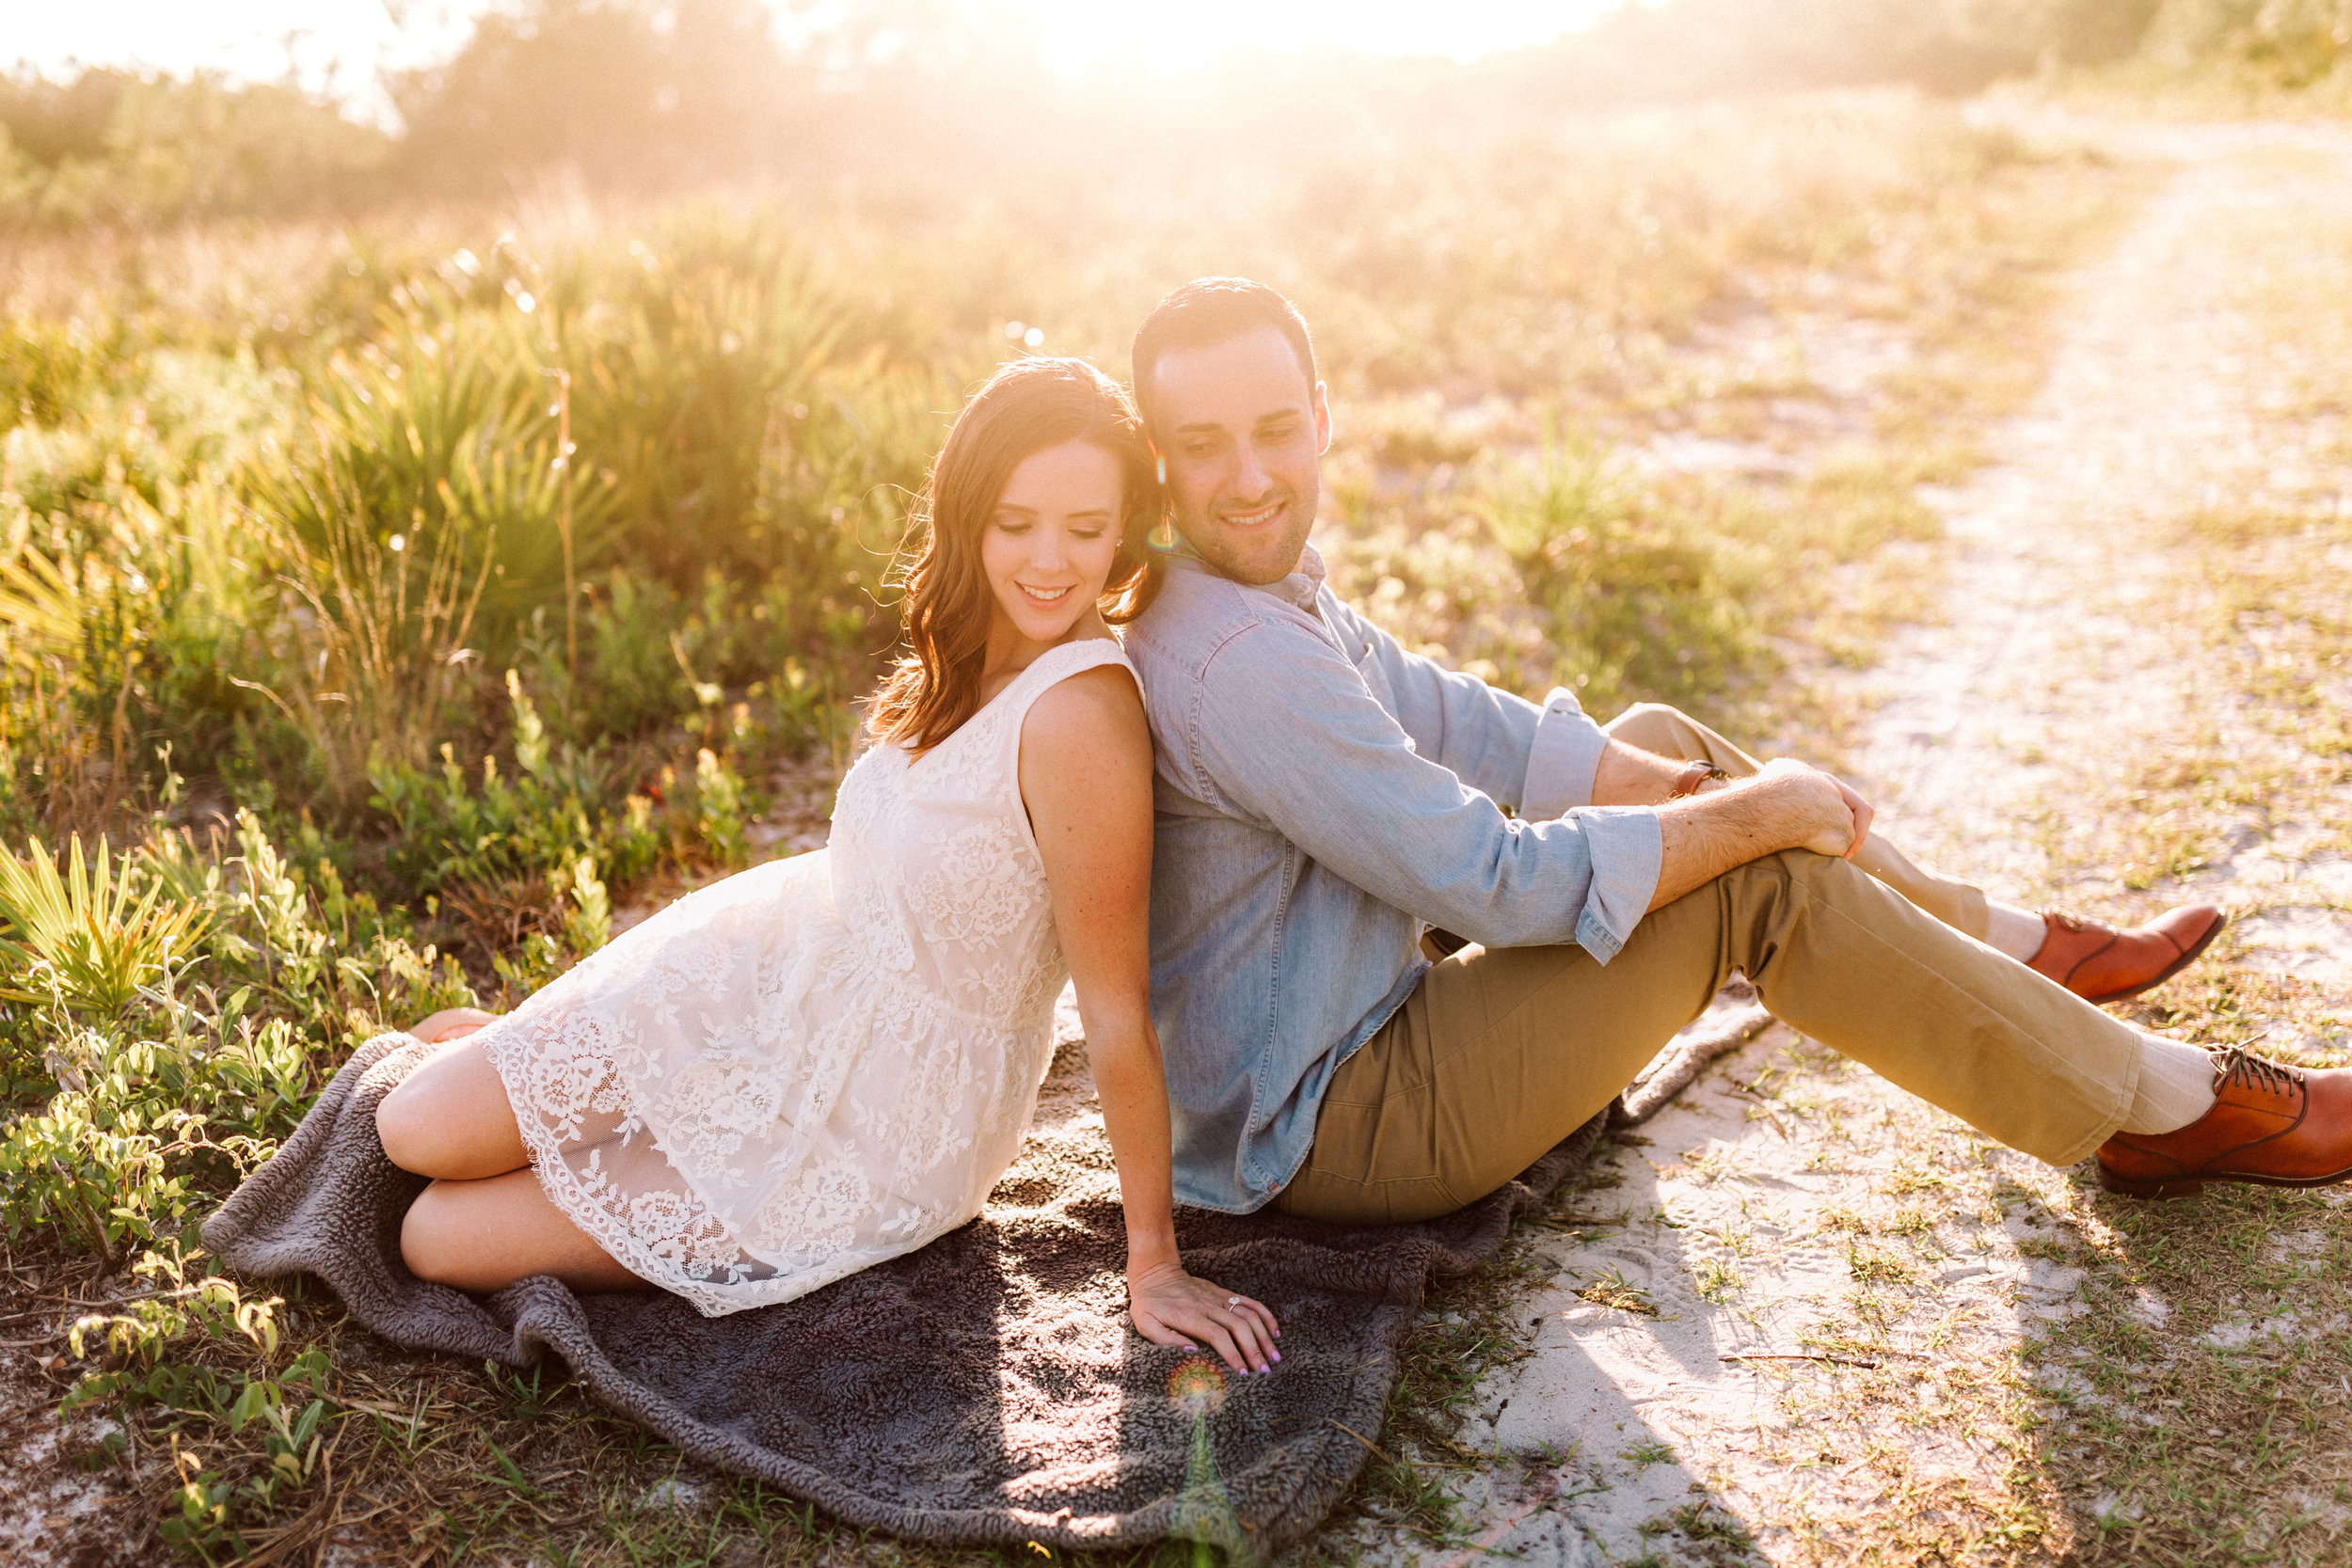 Orlando Engagement session at Wekiva Springs State Park nature-Anthony + Christine 19.jpg